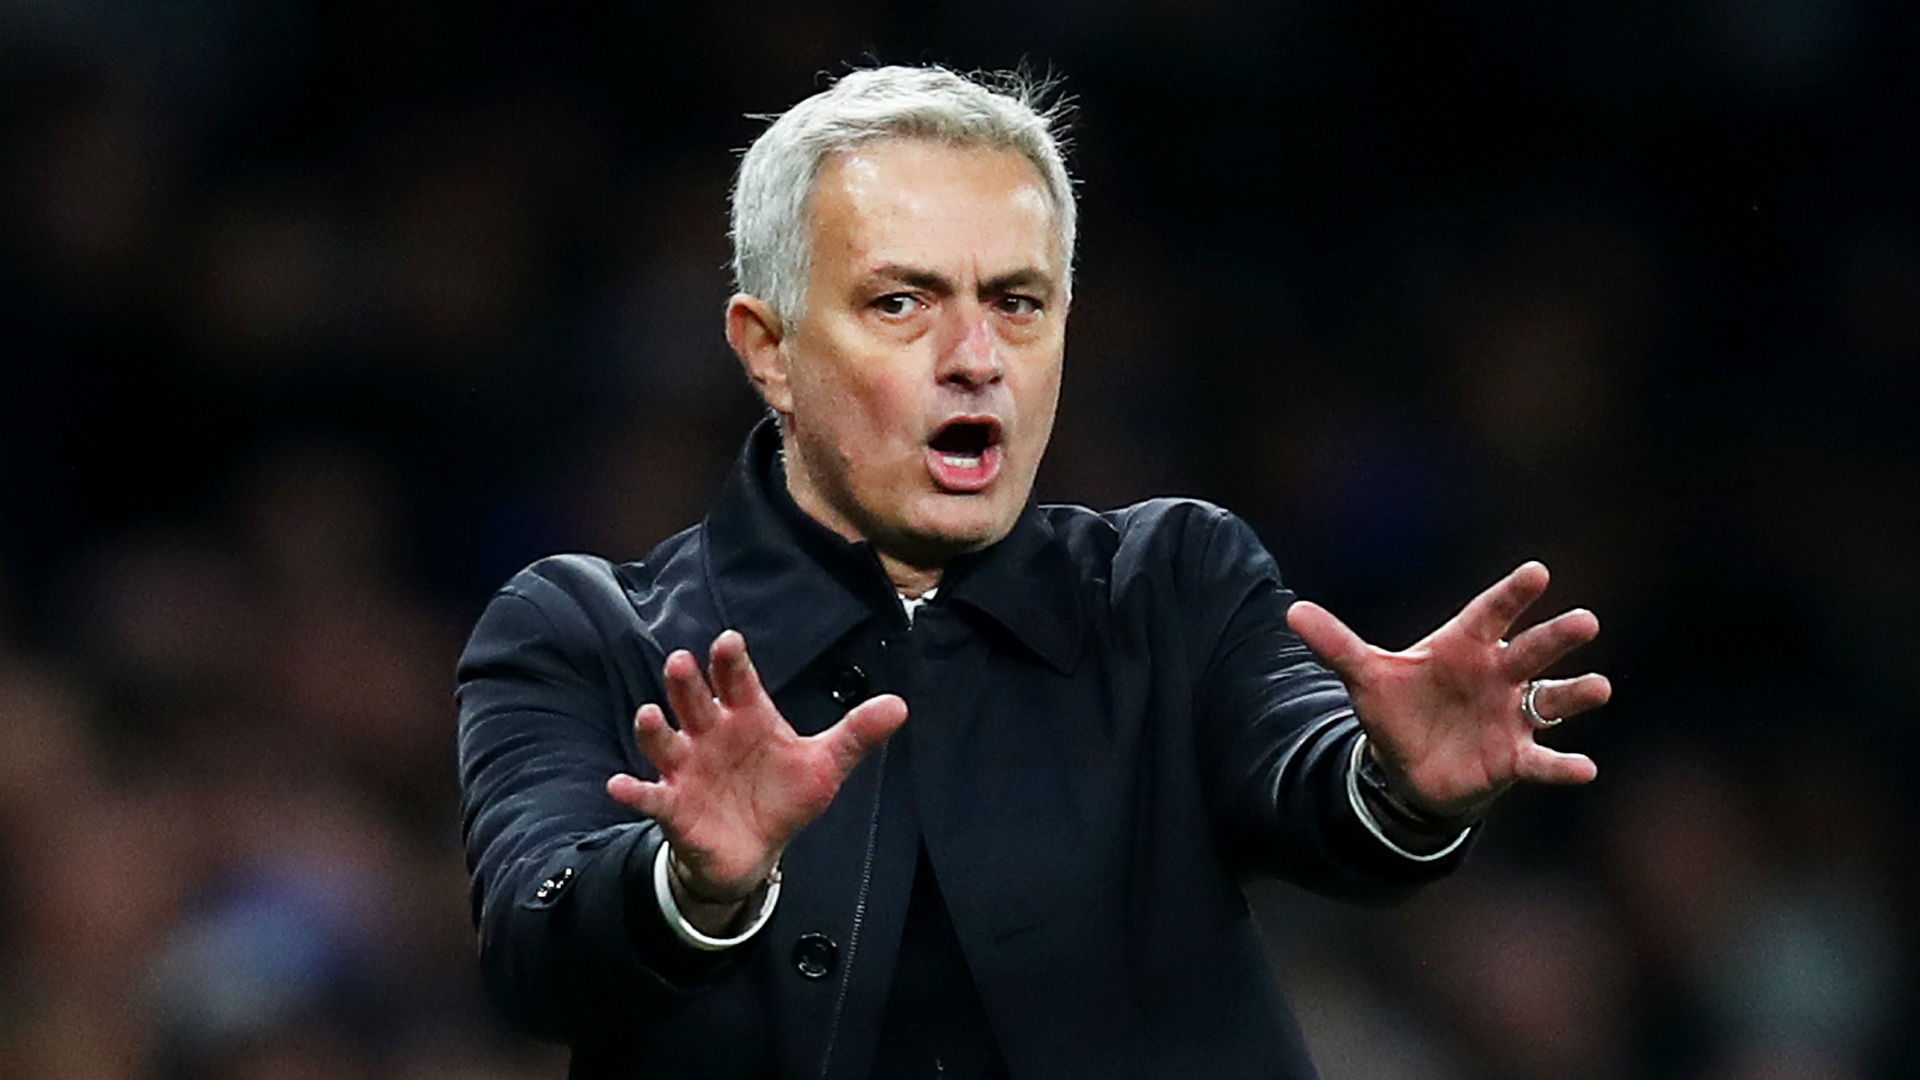 Tottenham Hotspur Fans Accept Me As This - Jose Mourinho